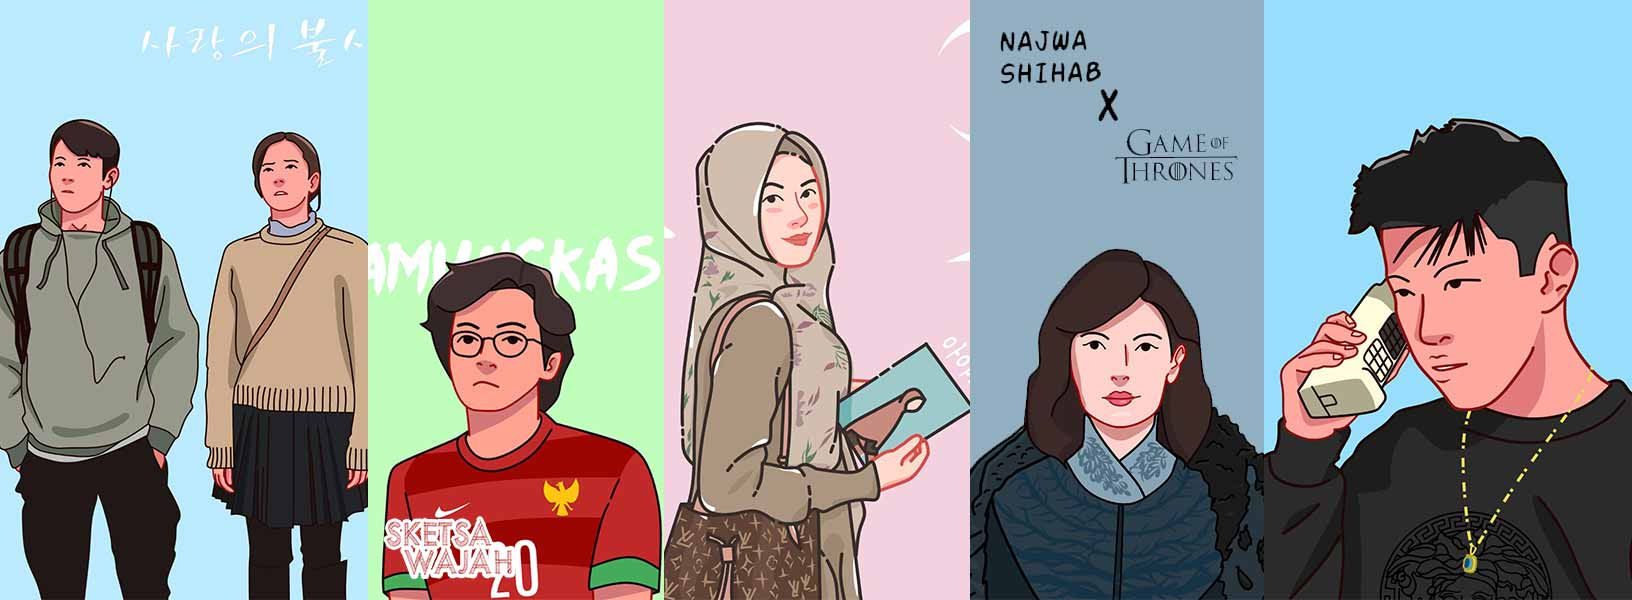 Karya Farchan Noor Himawan sketcher Sketsa Wajah